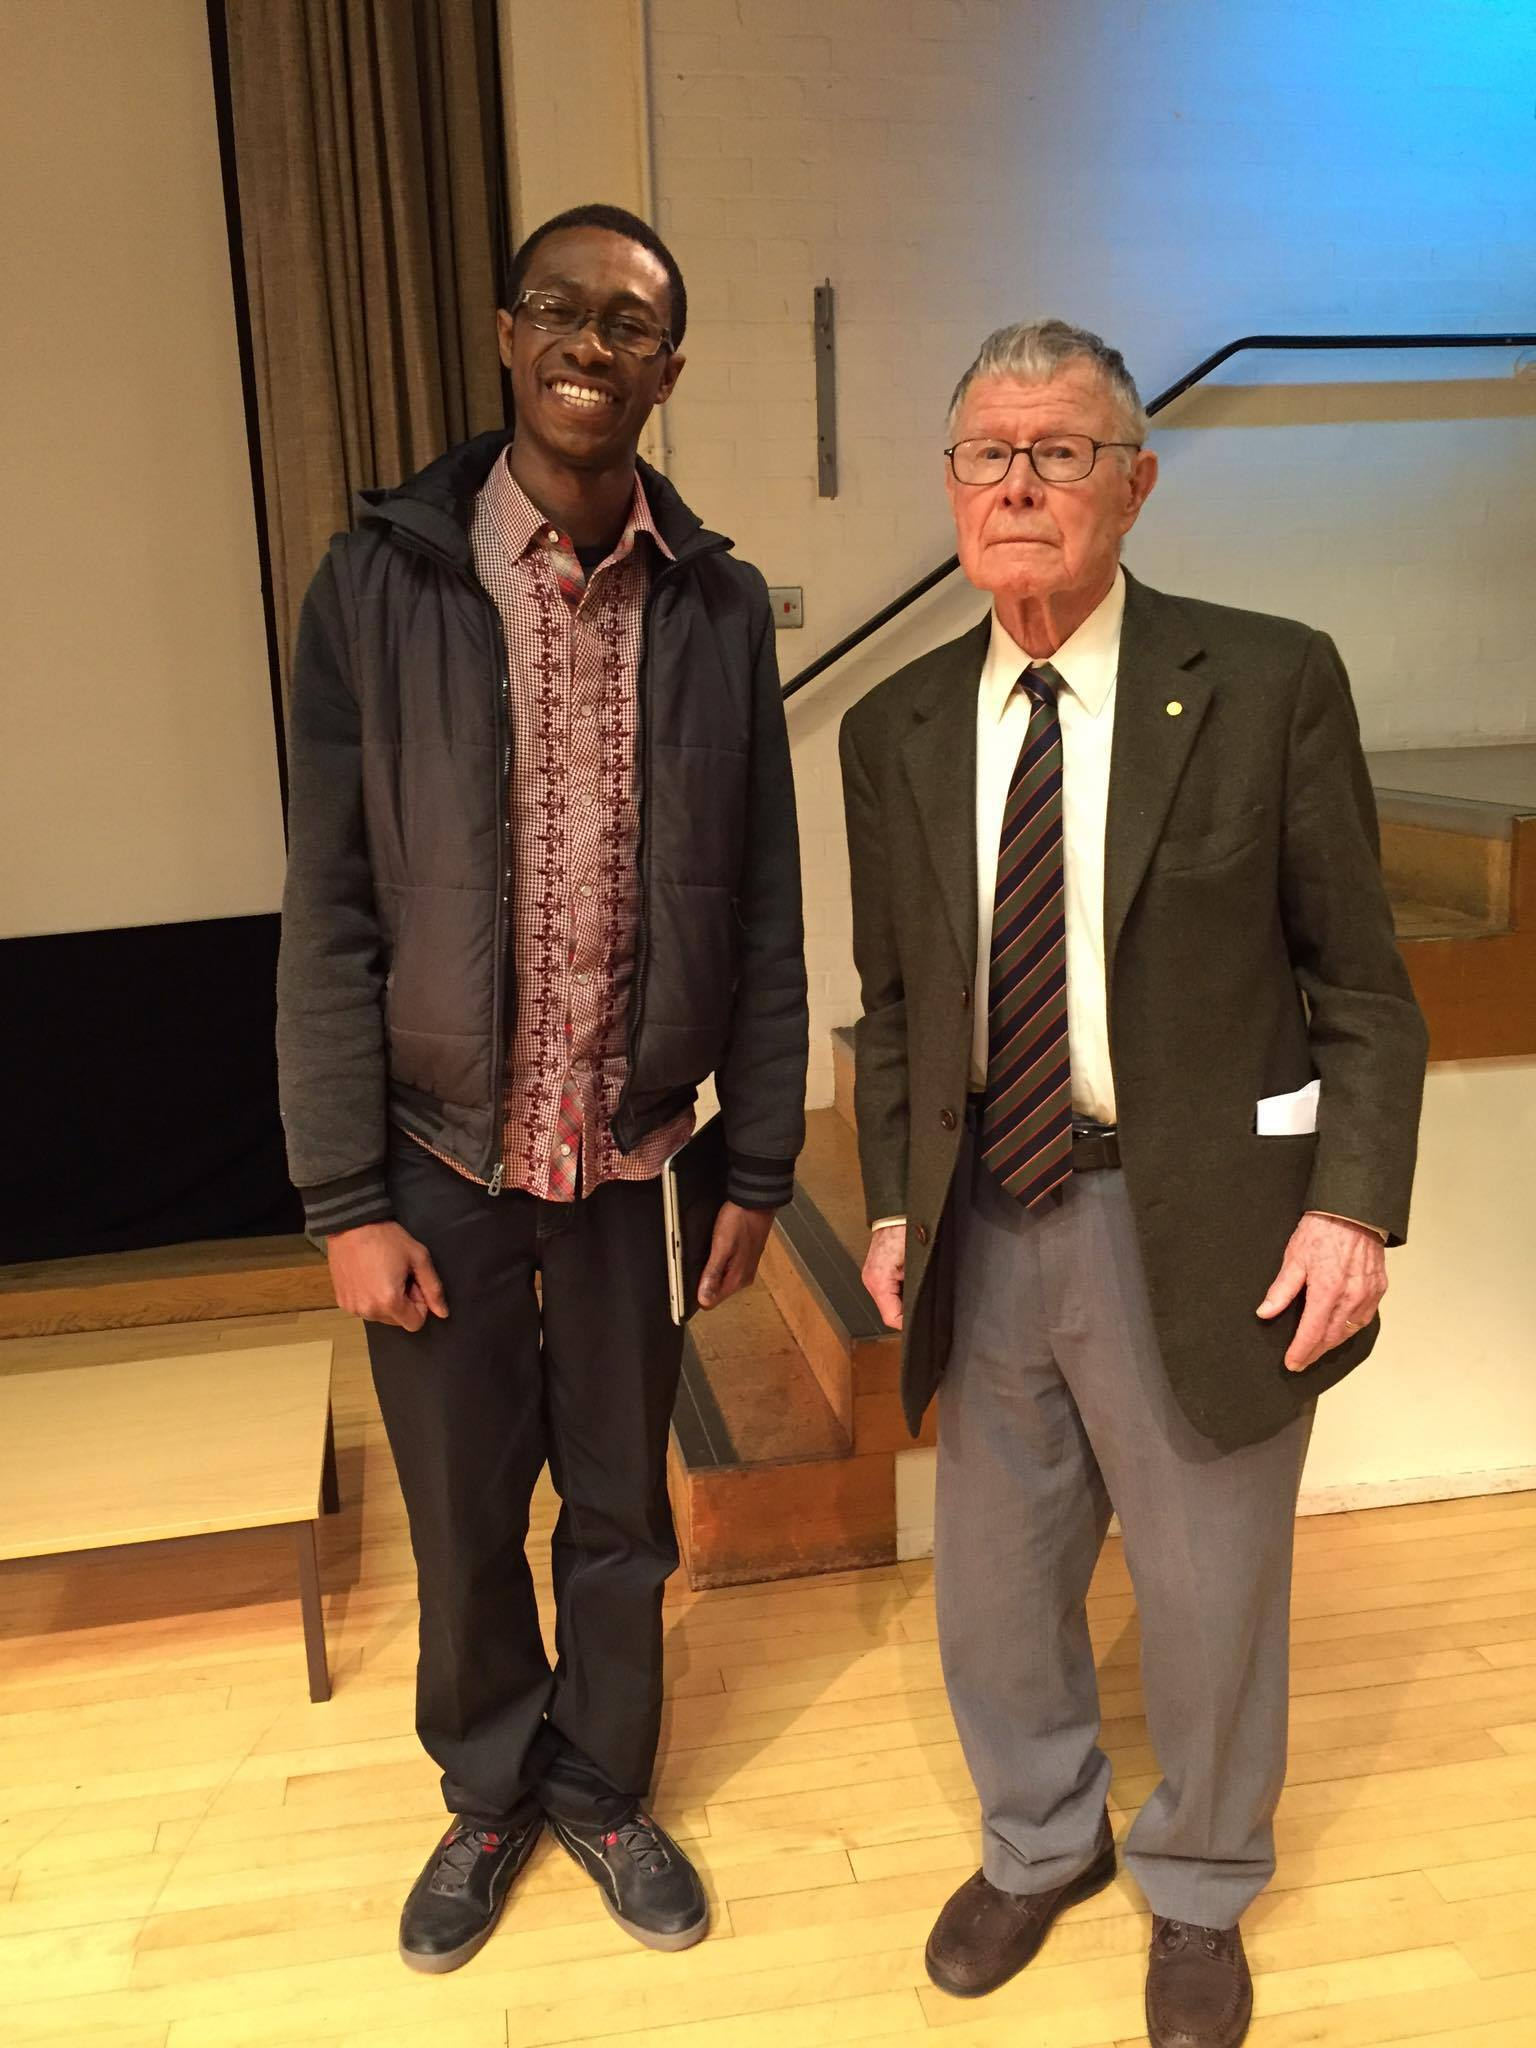 marc-with-nobel-prize-winning-economist-thomas-schelling